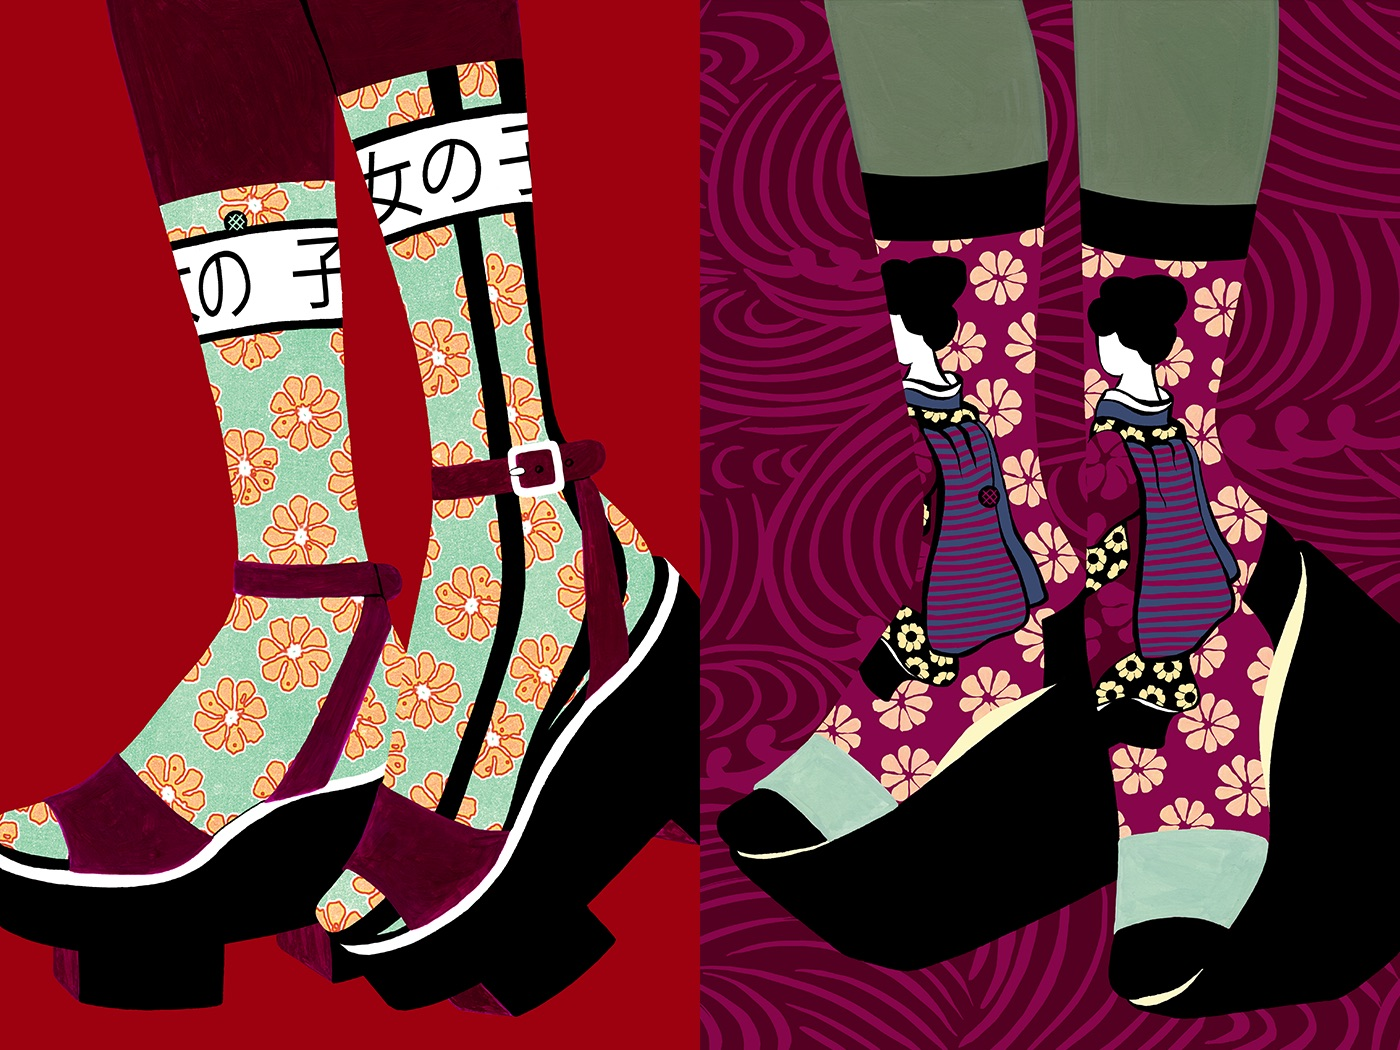 rihanna-stance-fenty-socks-collab-02